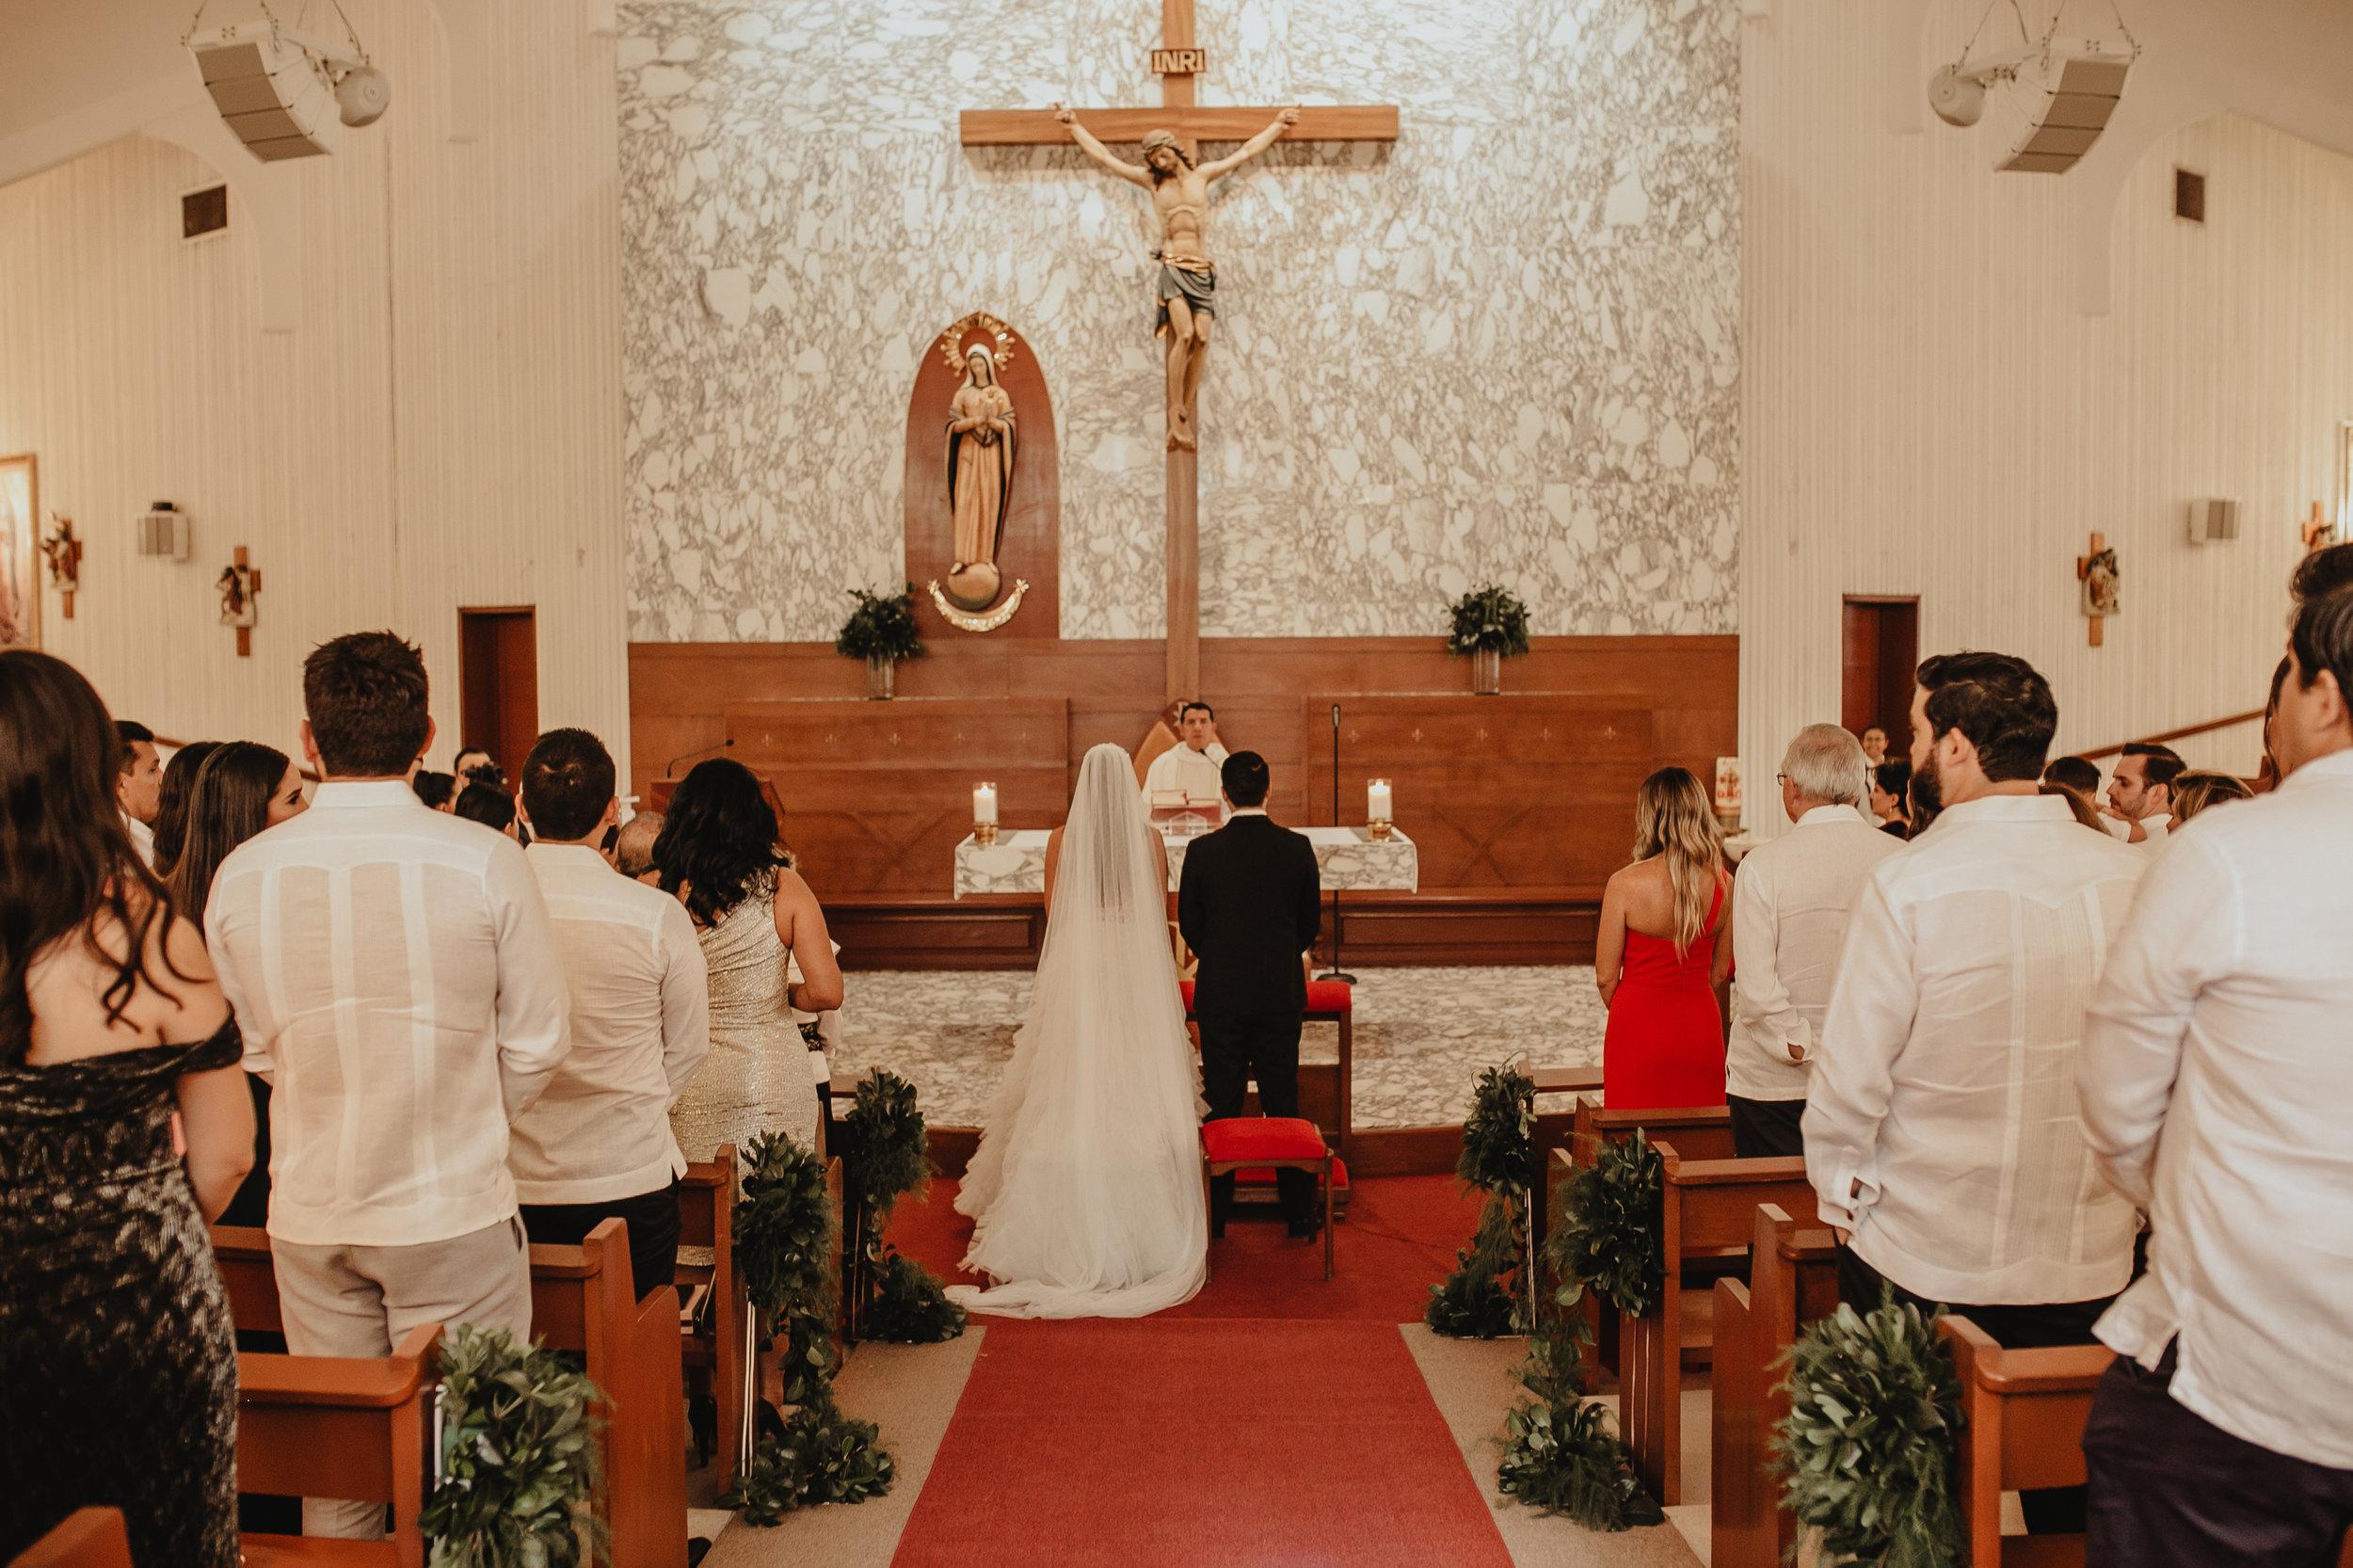 0587R&F__WeddingDestination_Weddingmerida_BodaMexico_FotografoDeBodas_FabrizioSimoneenFotografo.jpg